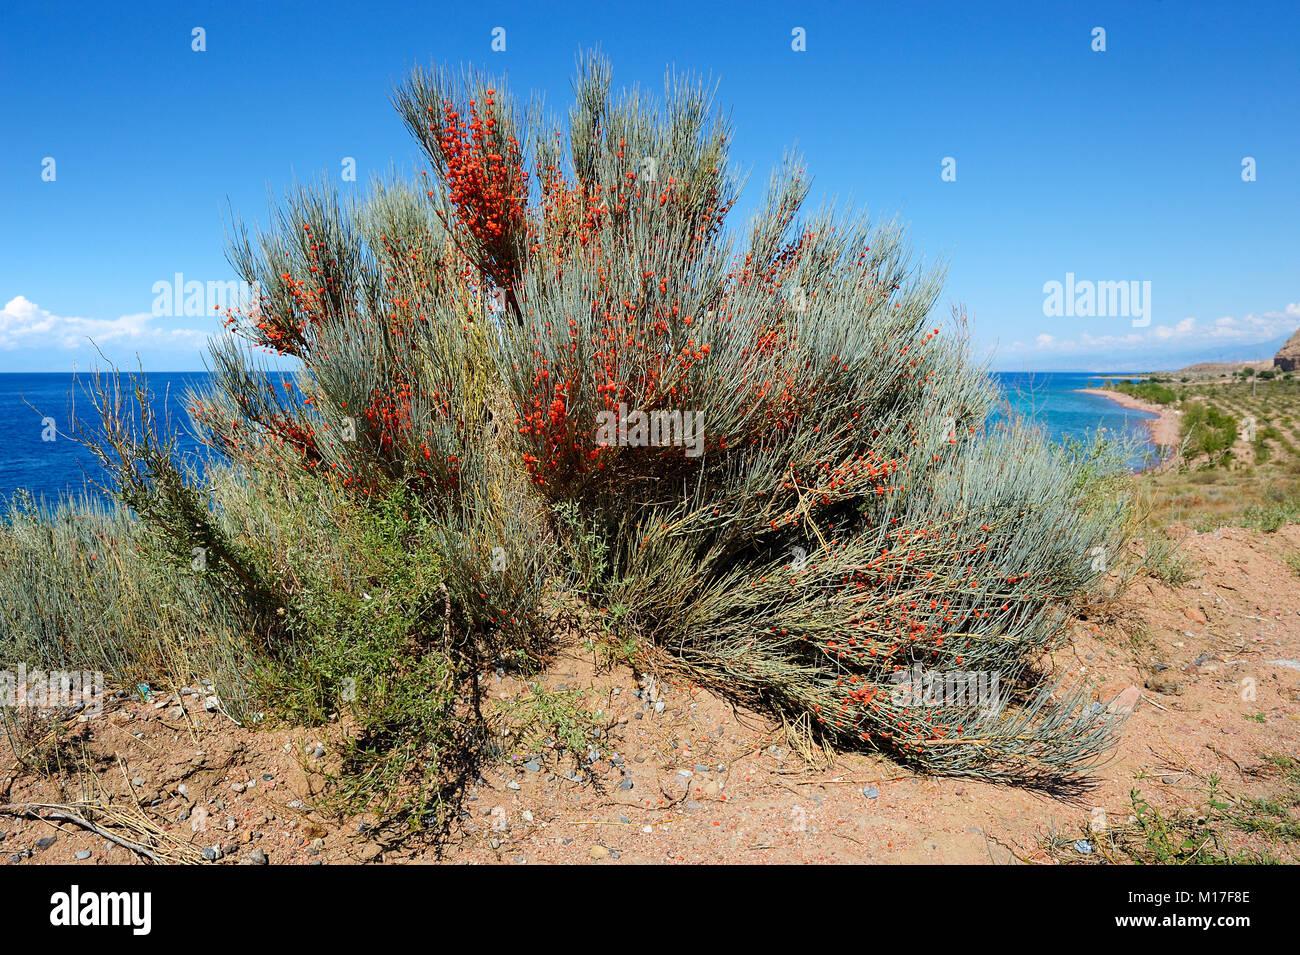 Ephedra equisetina with berries - Stock Image